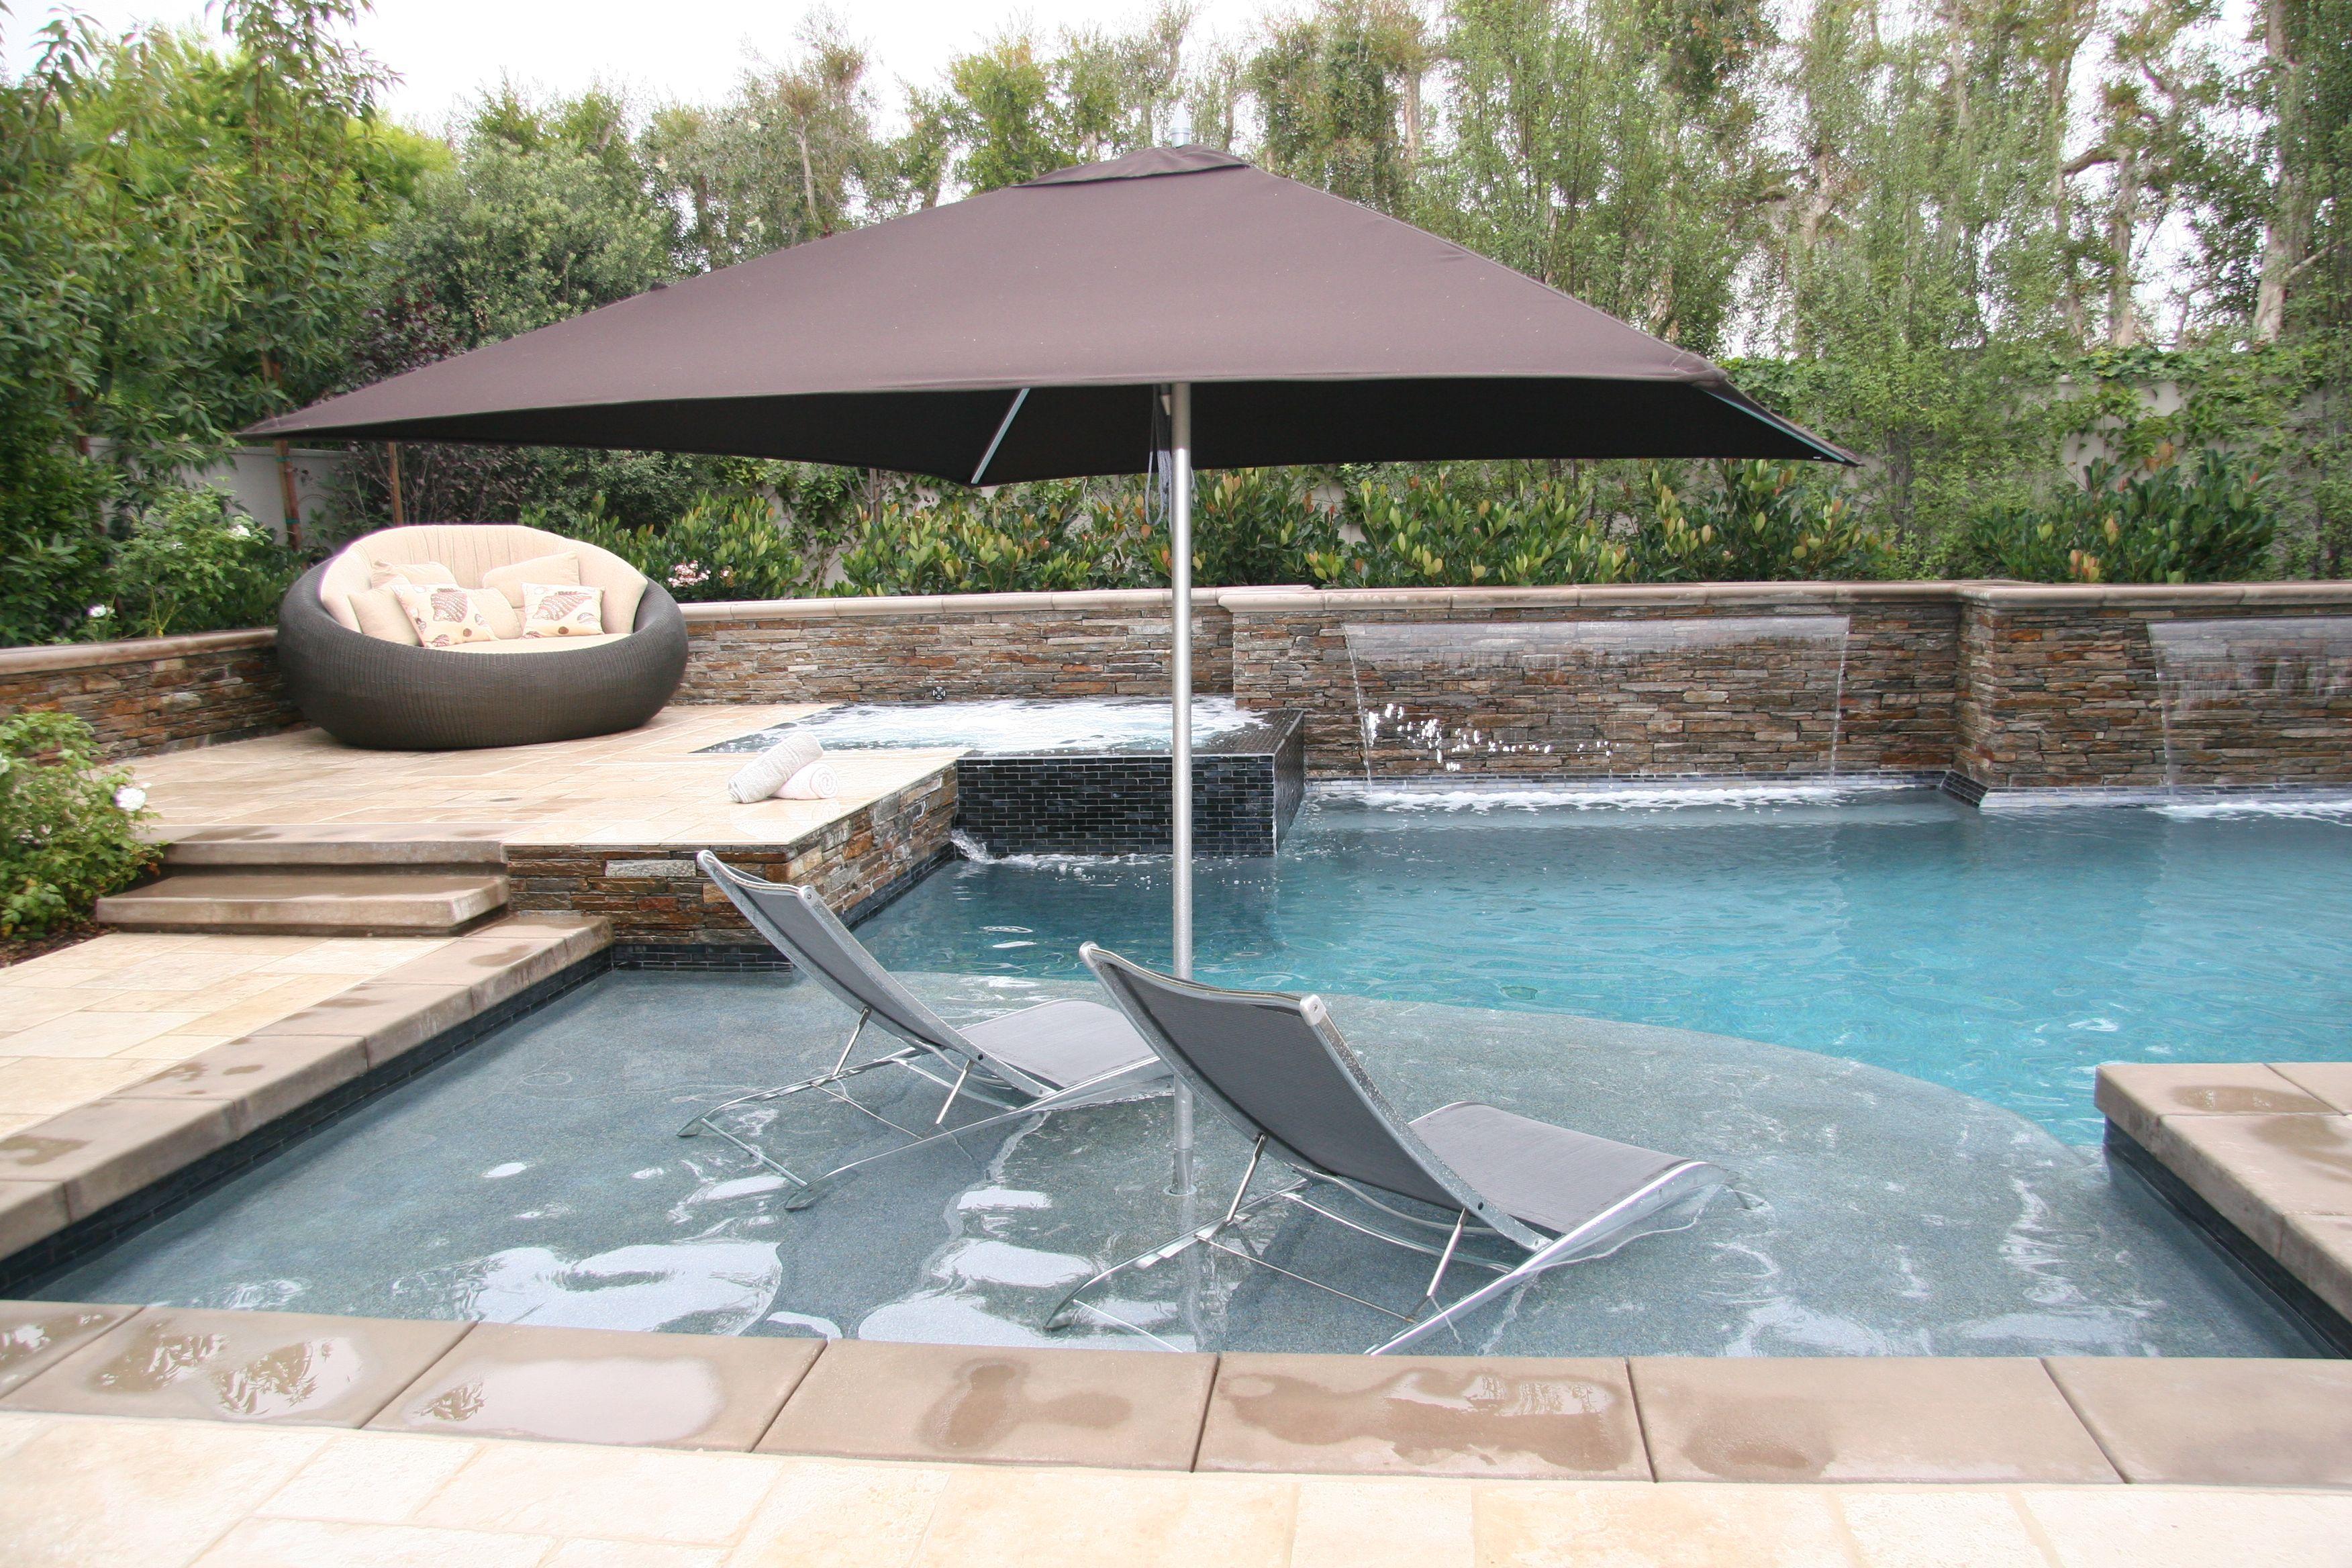 Lounge Chairs And Umbrella On Baja Shelf Cardin Beach In